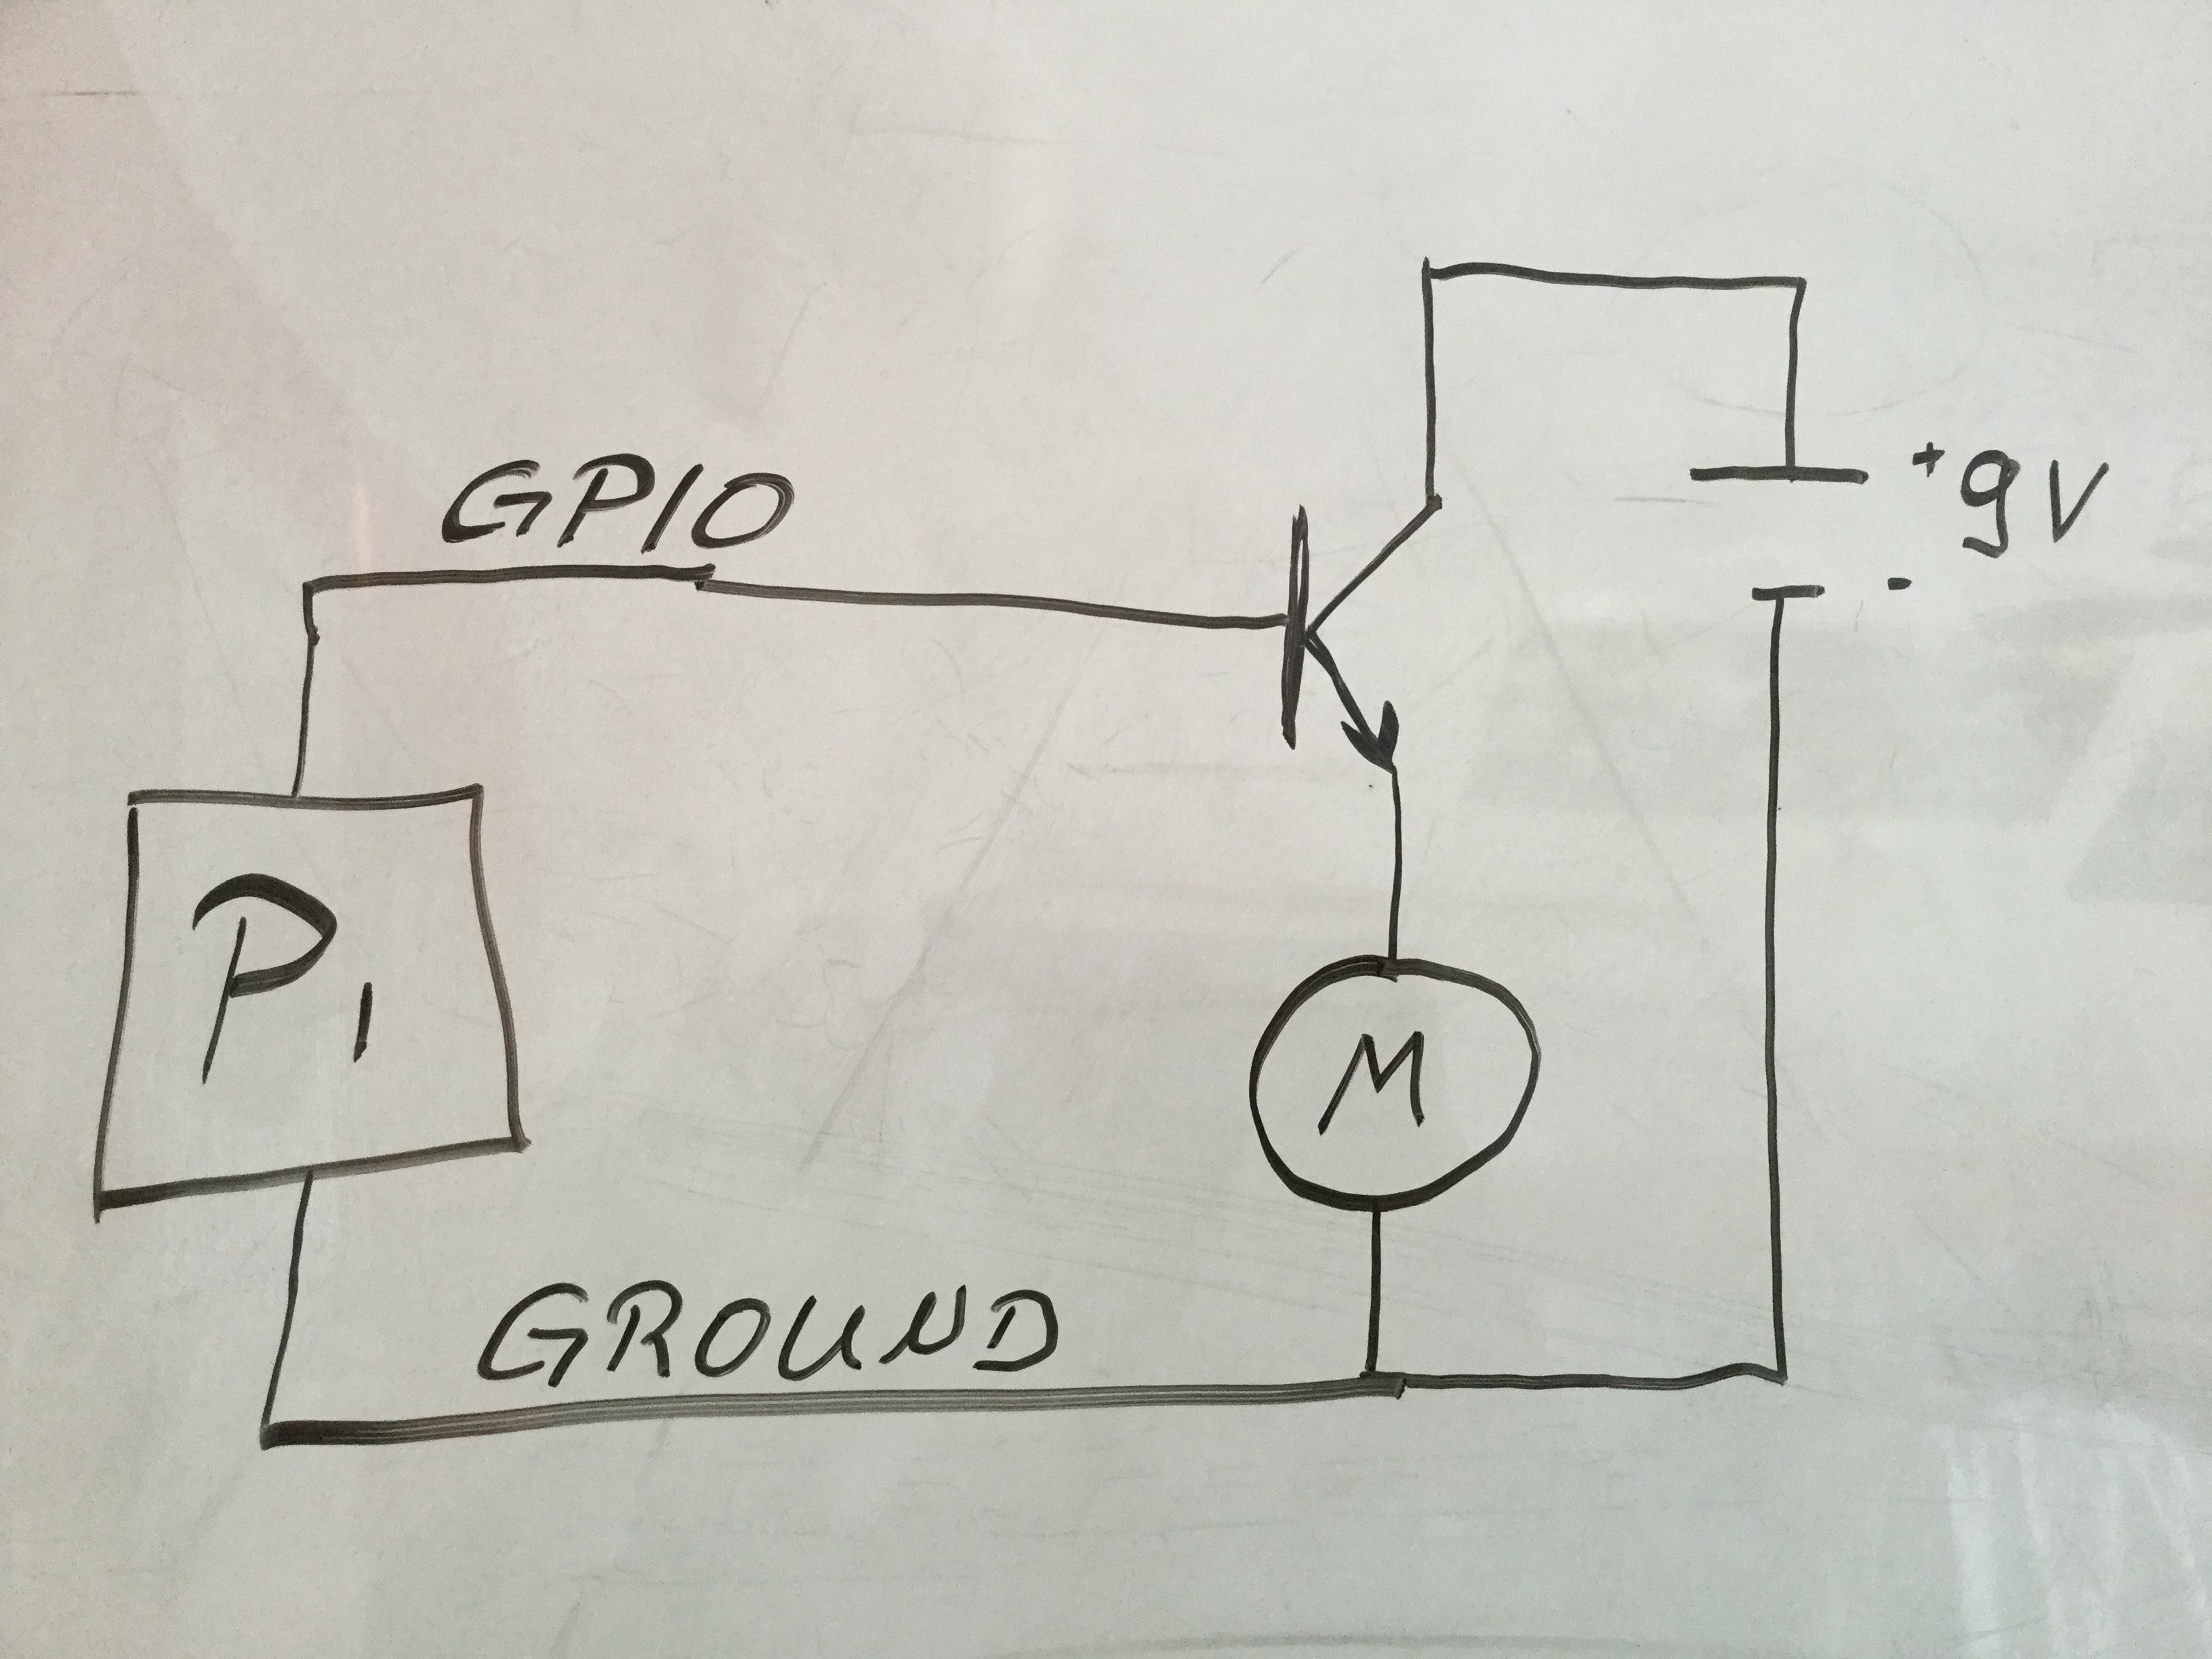 Atemberaubend Grundlegende Autoverkabelung Ideen - Elektrische ...